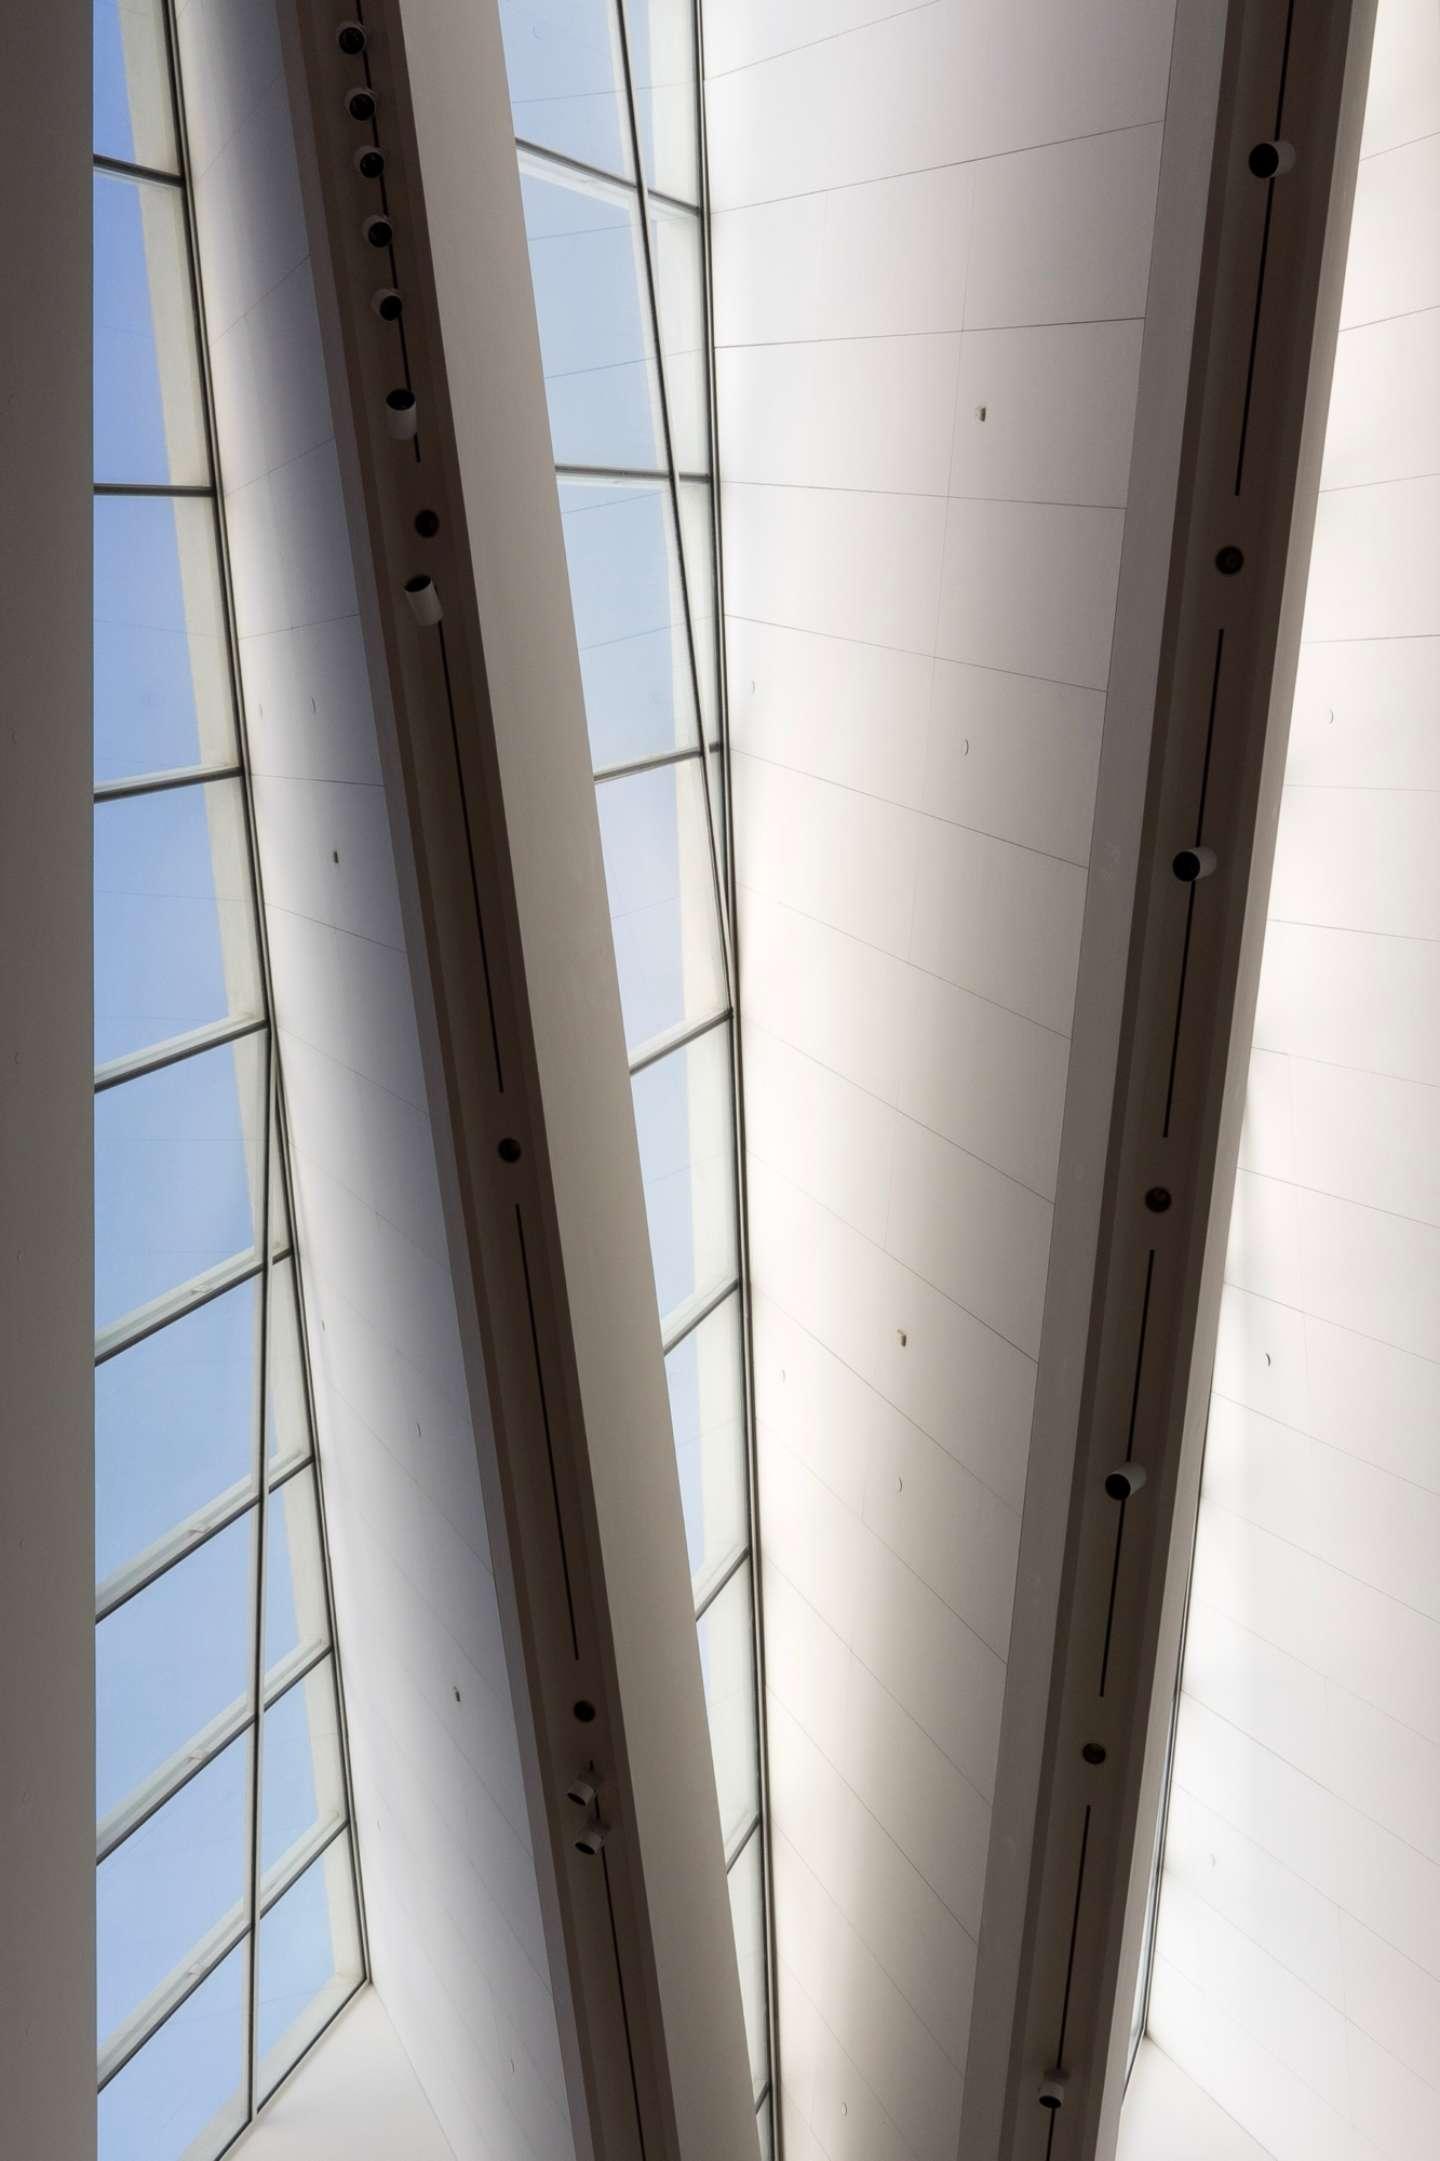 Blanton Museum of Art: Skylights 2017-08-30